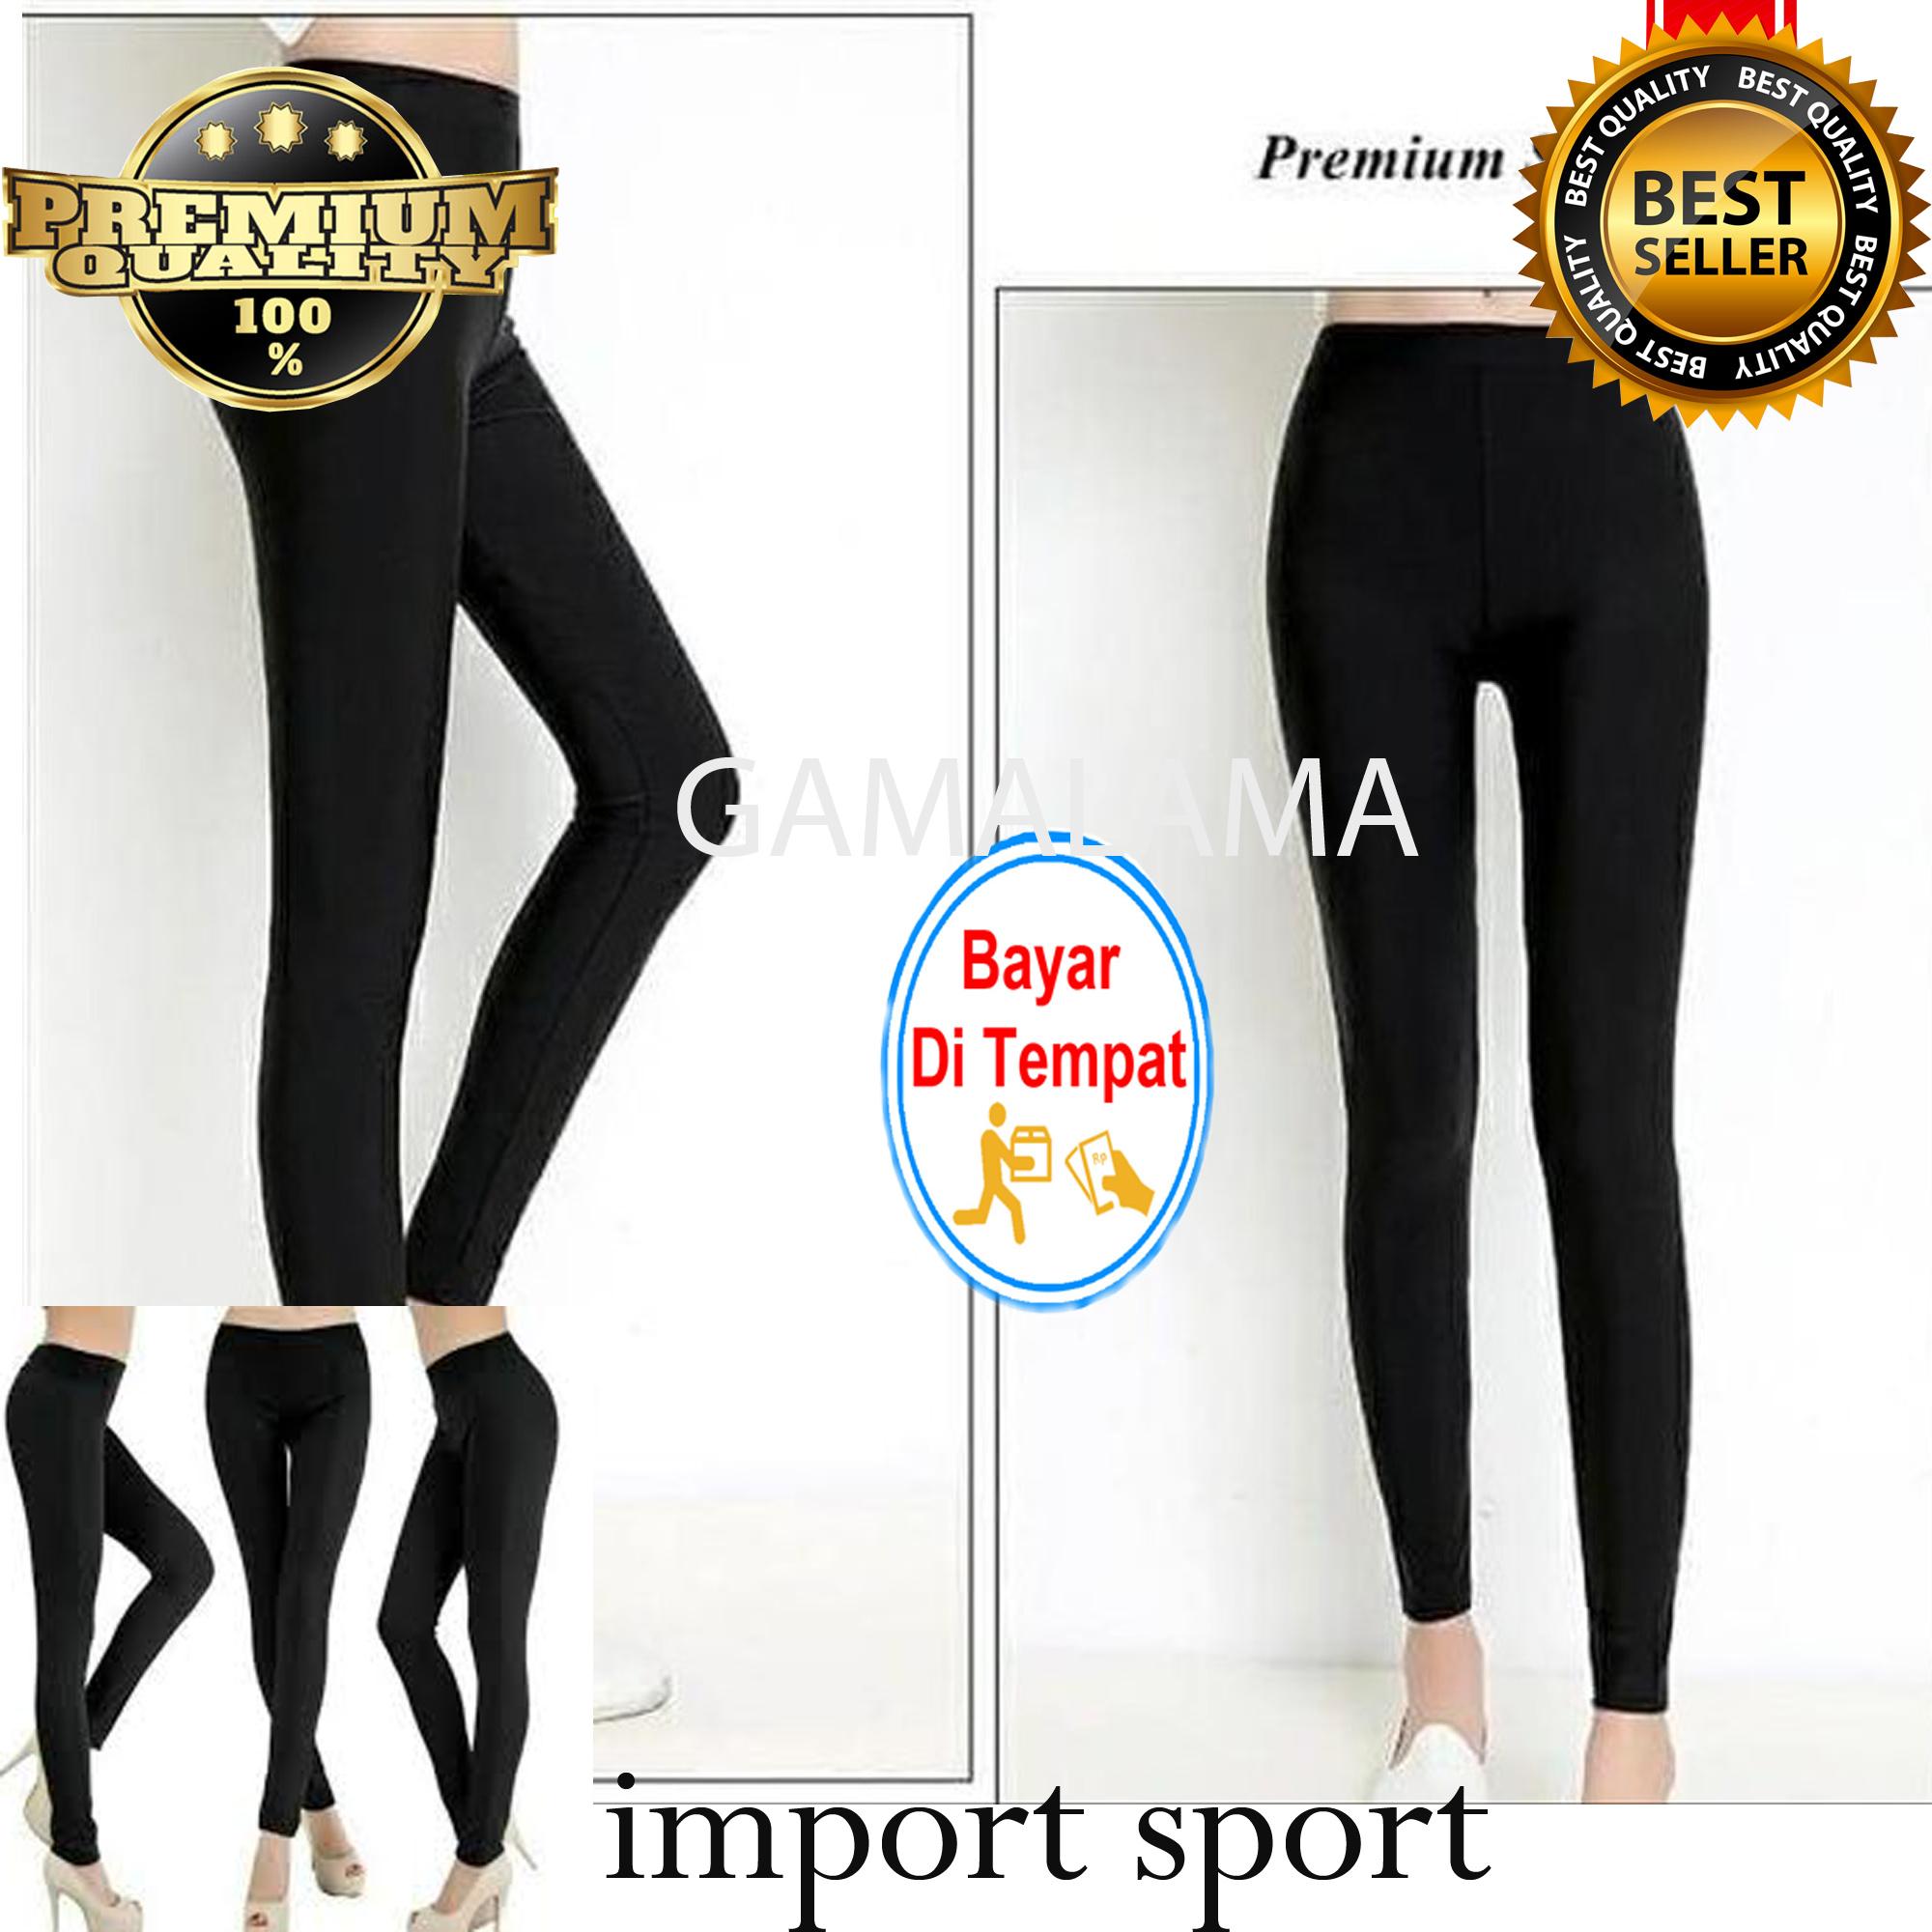 Celana Legging Laging Wanita Celana Laging Wanita Polos Terbaru Standar Jumbo Legging Leging Harga Grosir Lazada Indonesia